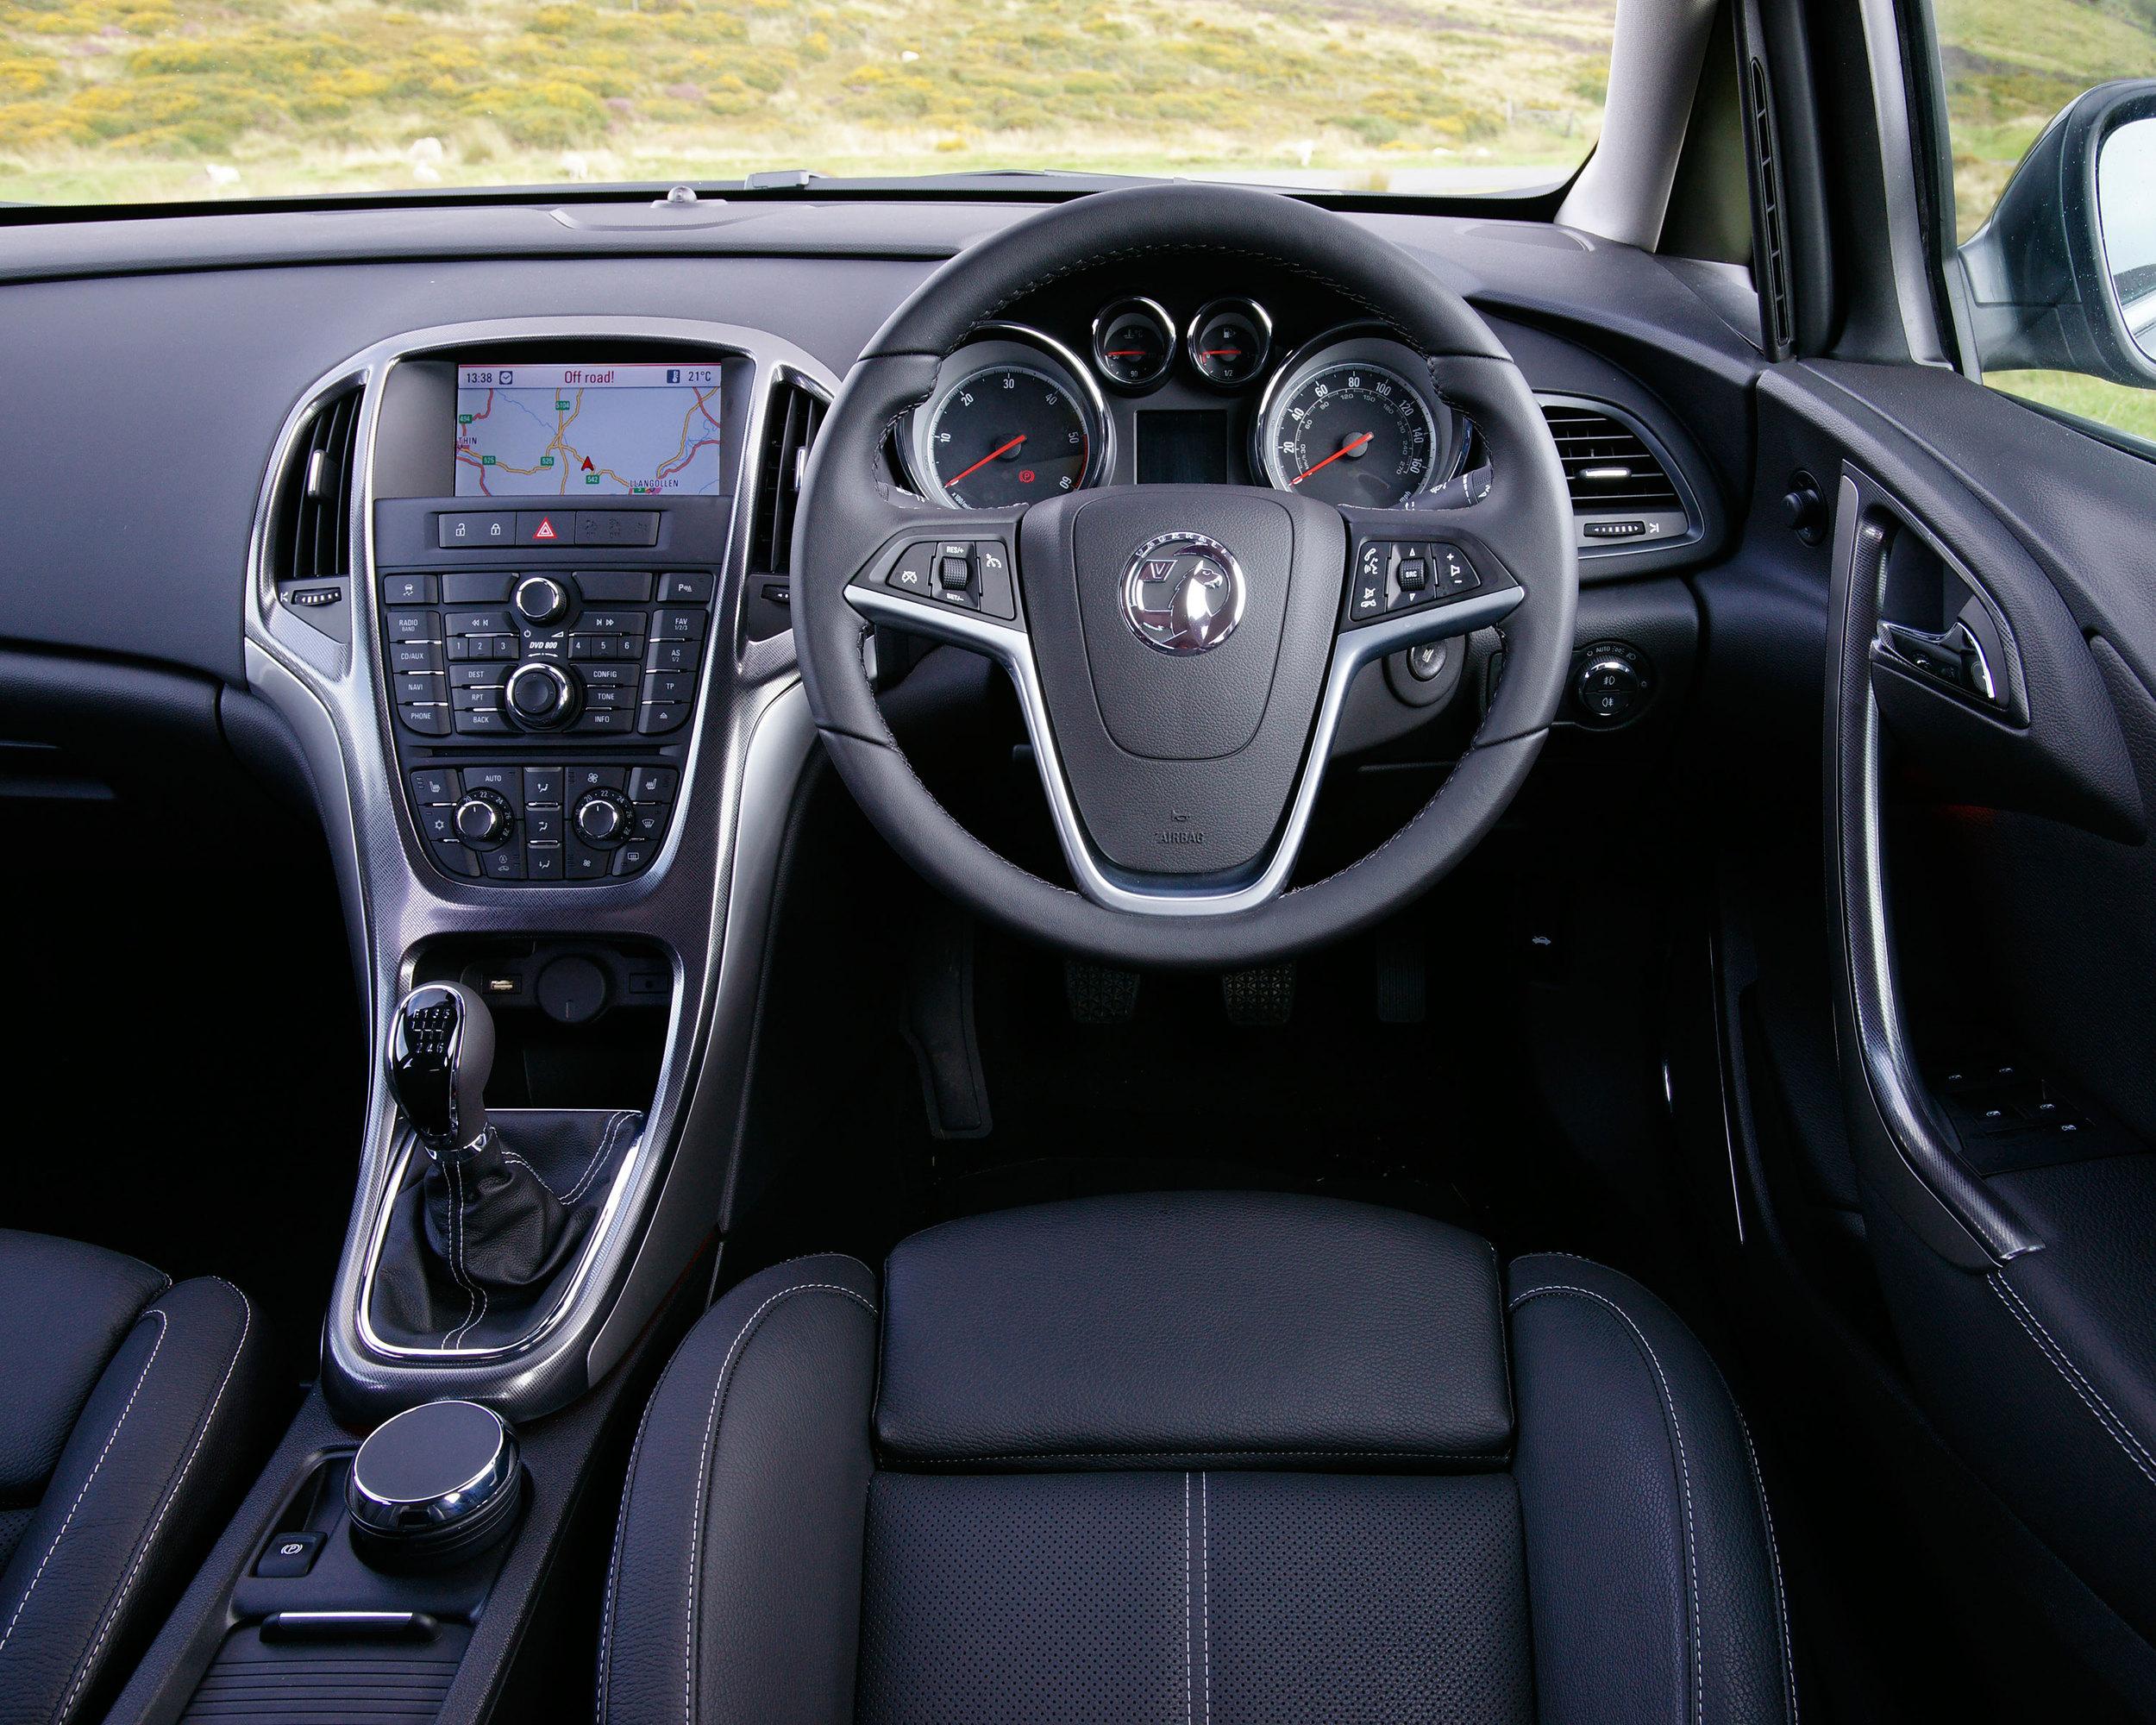 Vauxhall Astra Mk6 (2009-2015)